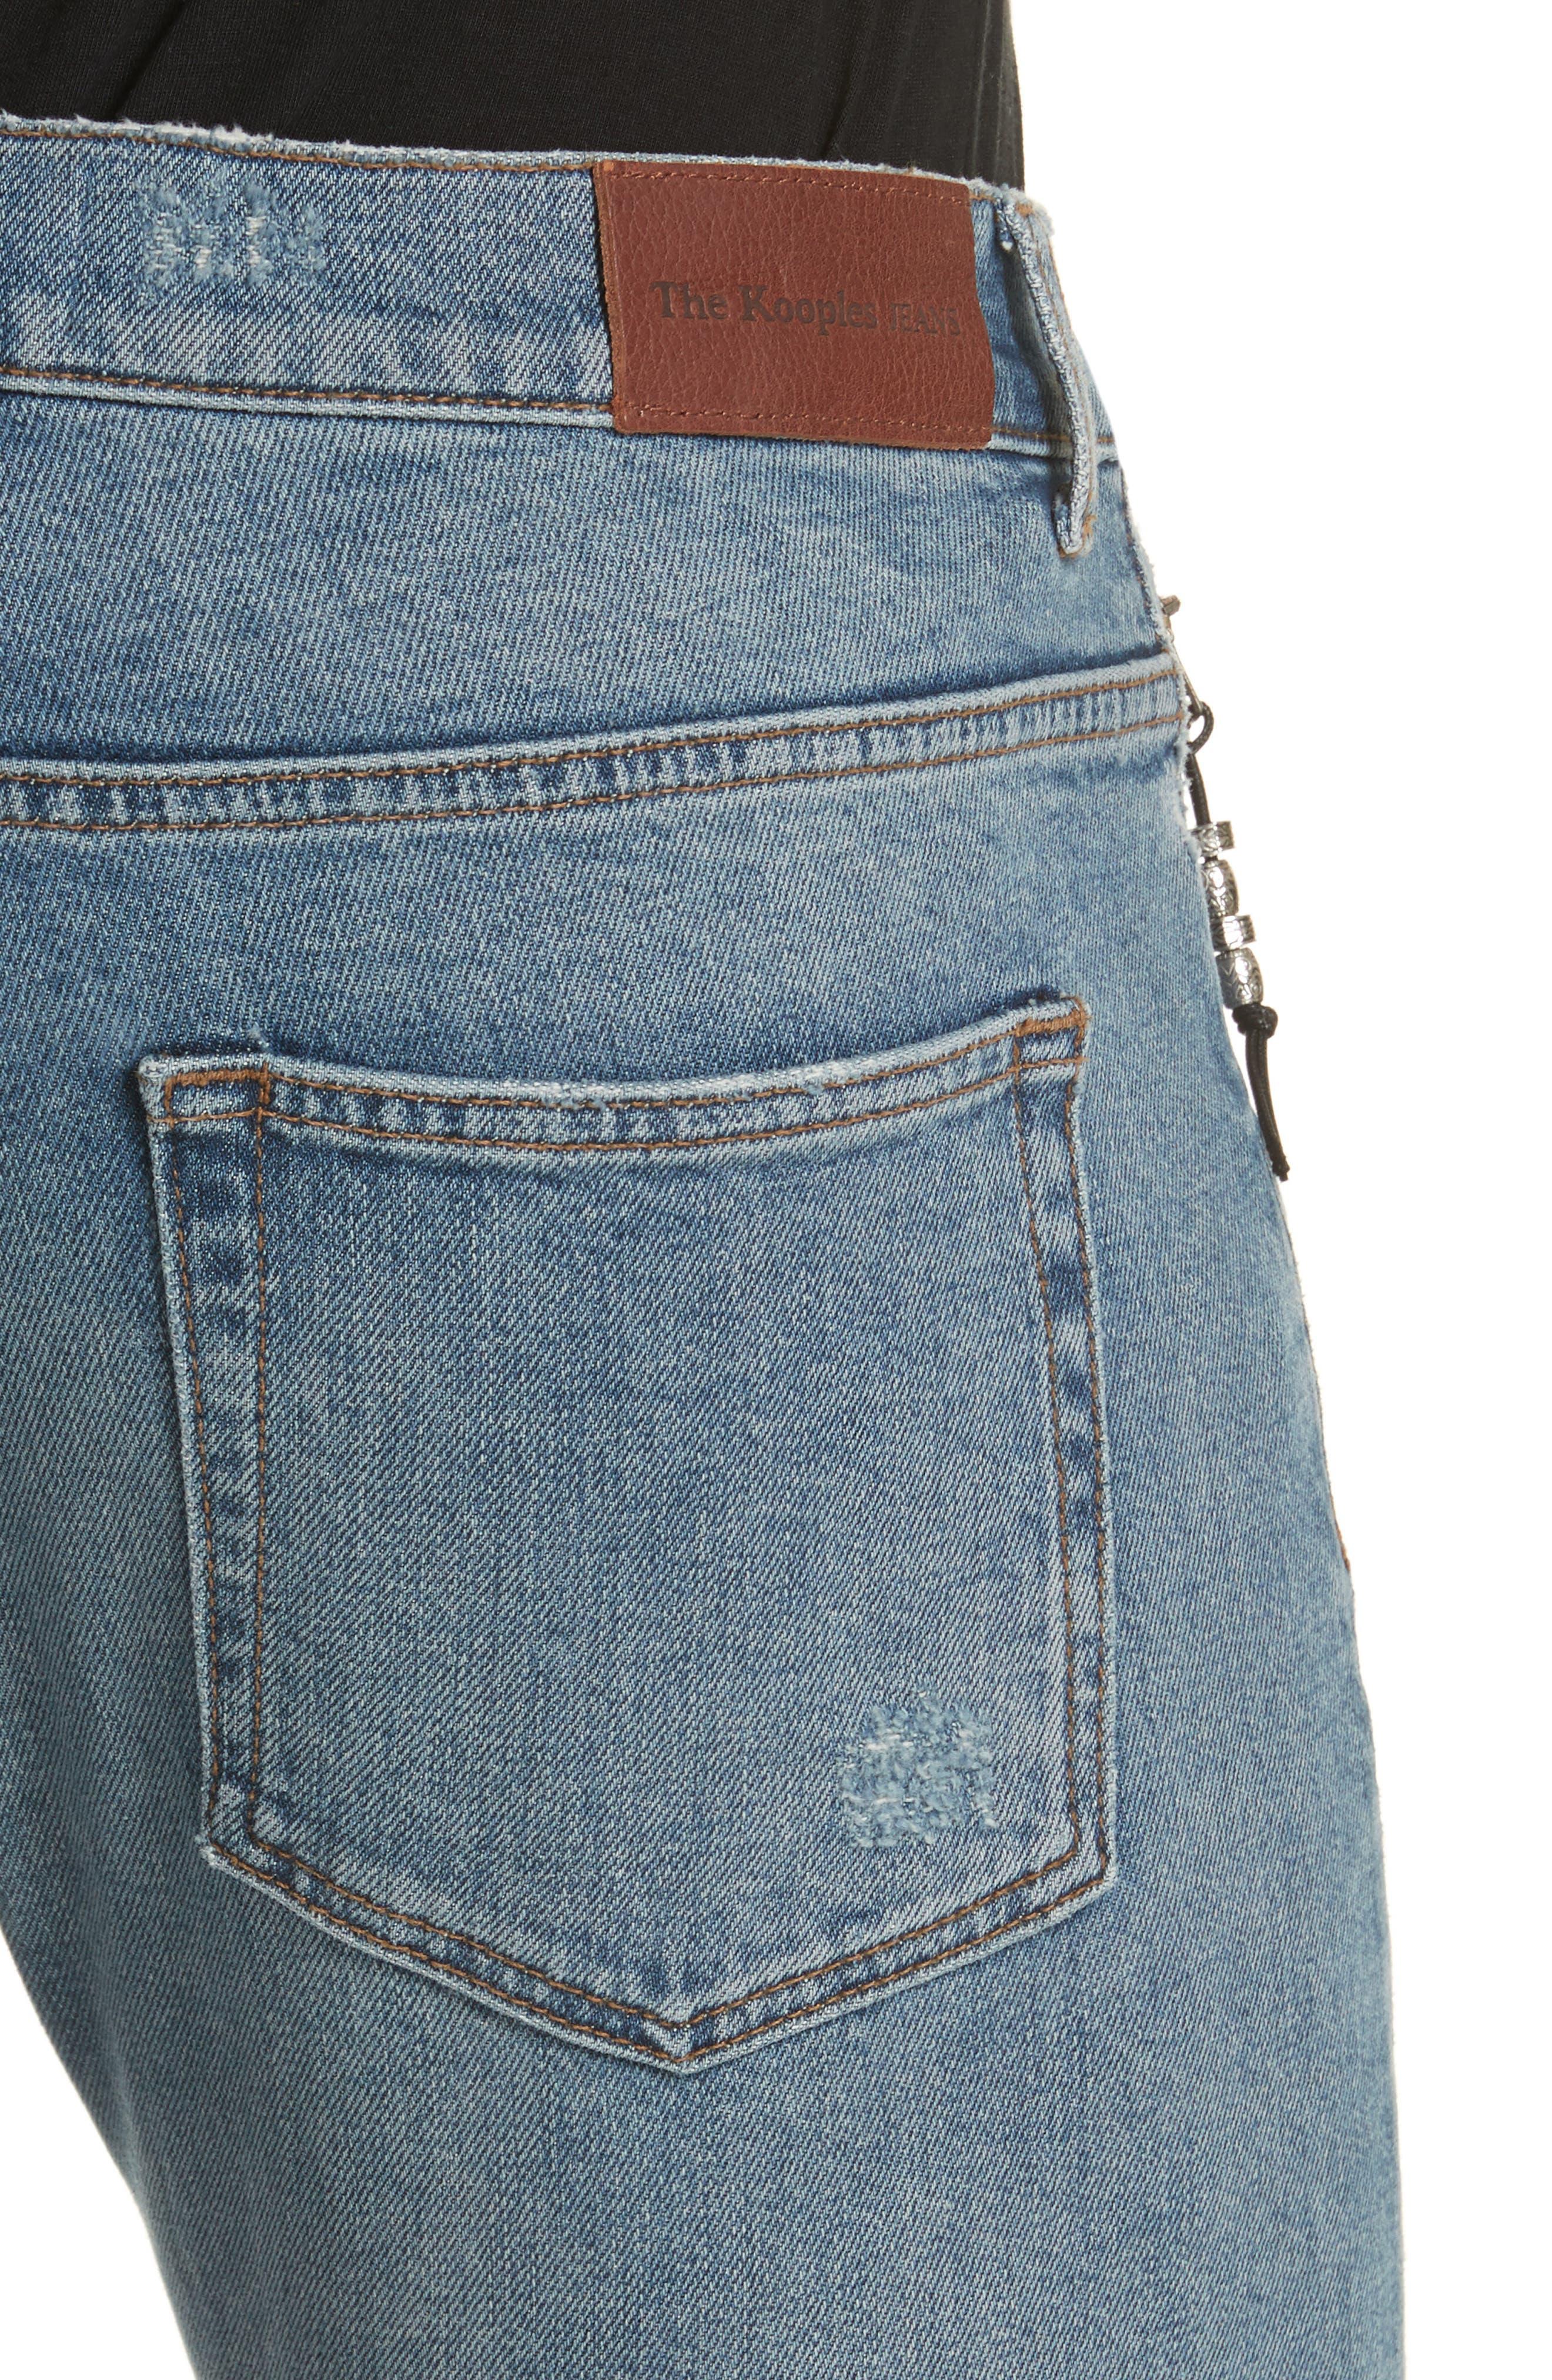 Destroyed Skinny Fit Jeans,                             Alternate thumbnail 4, color,                             400